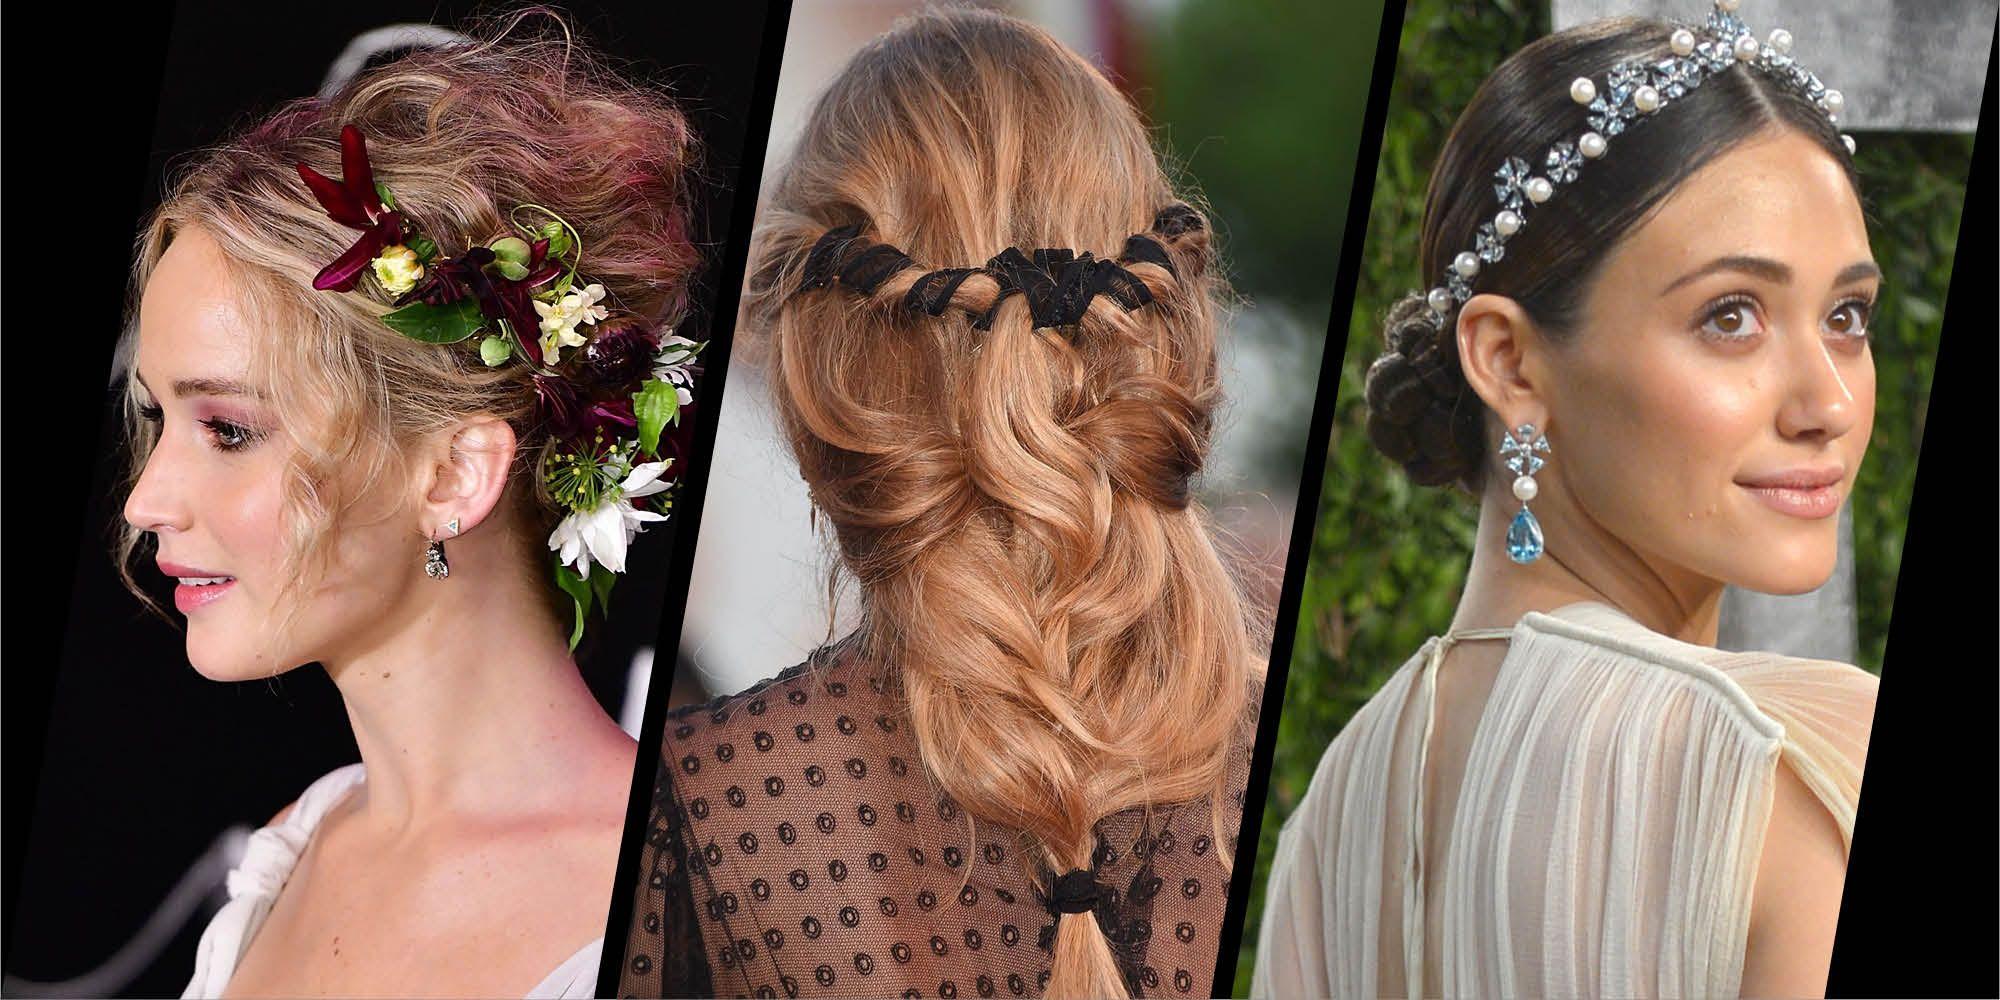 13 Winter Wedding Hair Ideas Bridal Hairstyles For Winter 2019